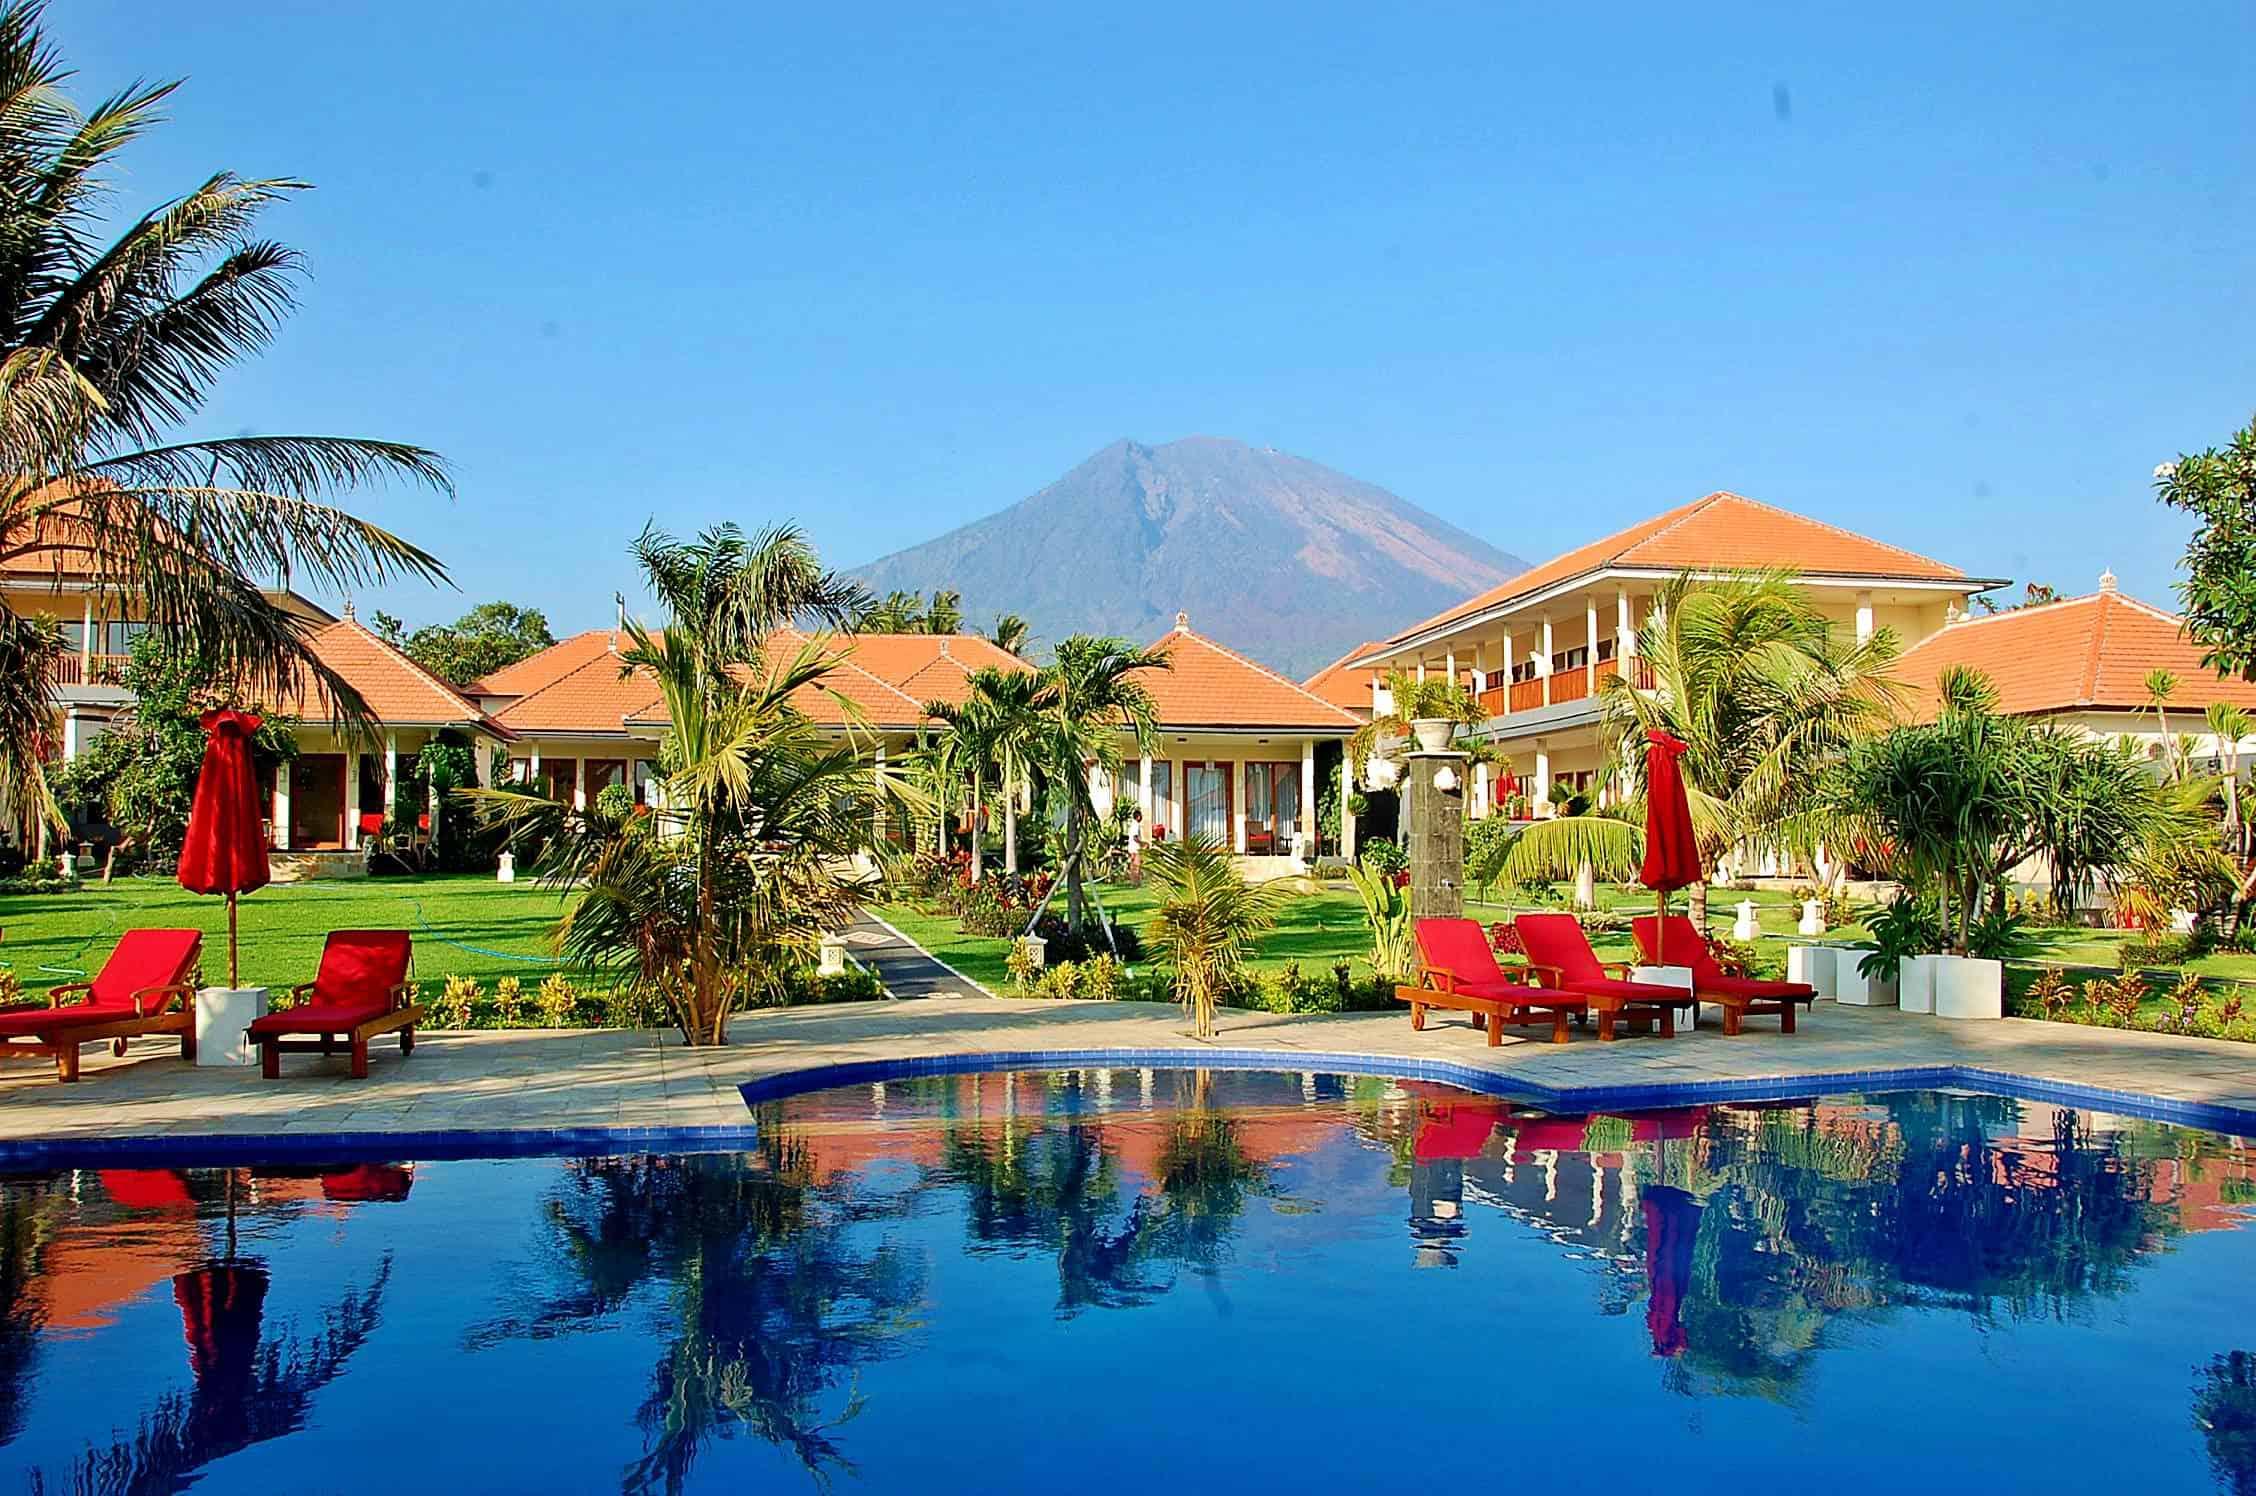 Bali dive resort and spa dive center reviews bali for Indonesia resorts bali